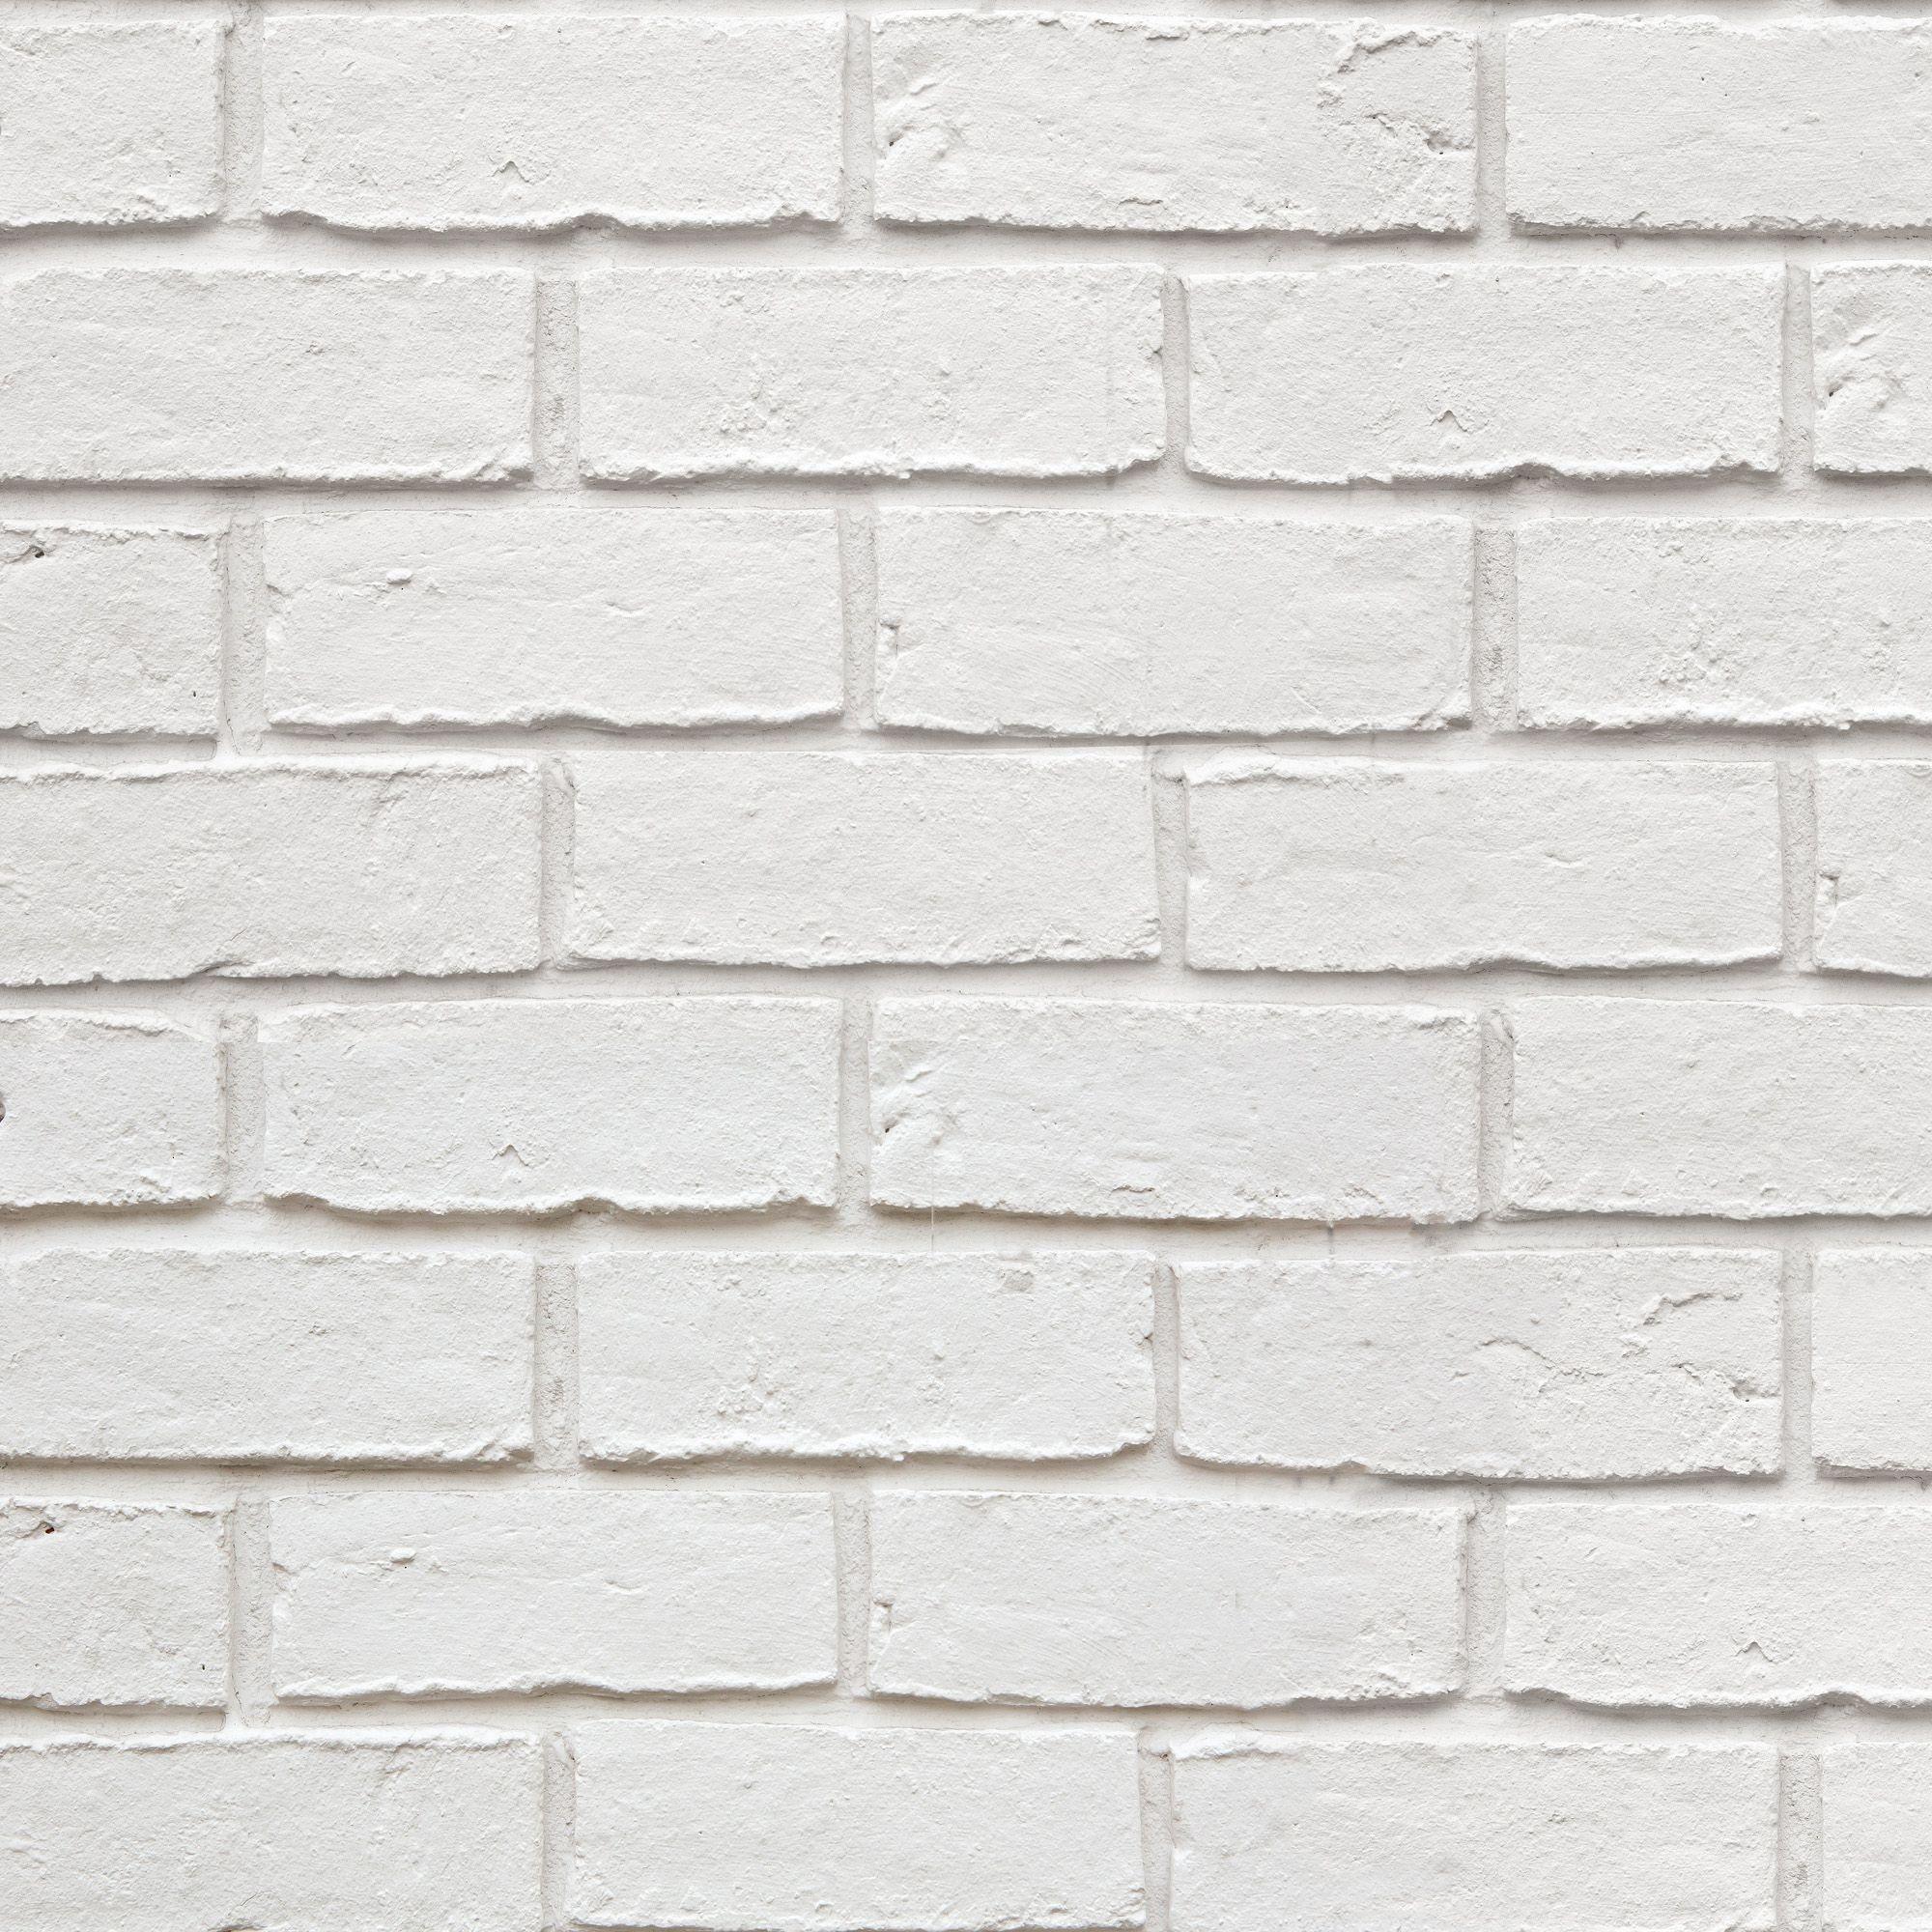 faux brick wall texture - photo #6